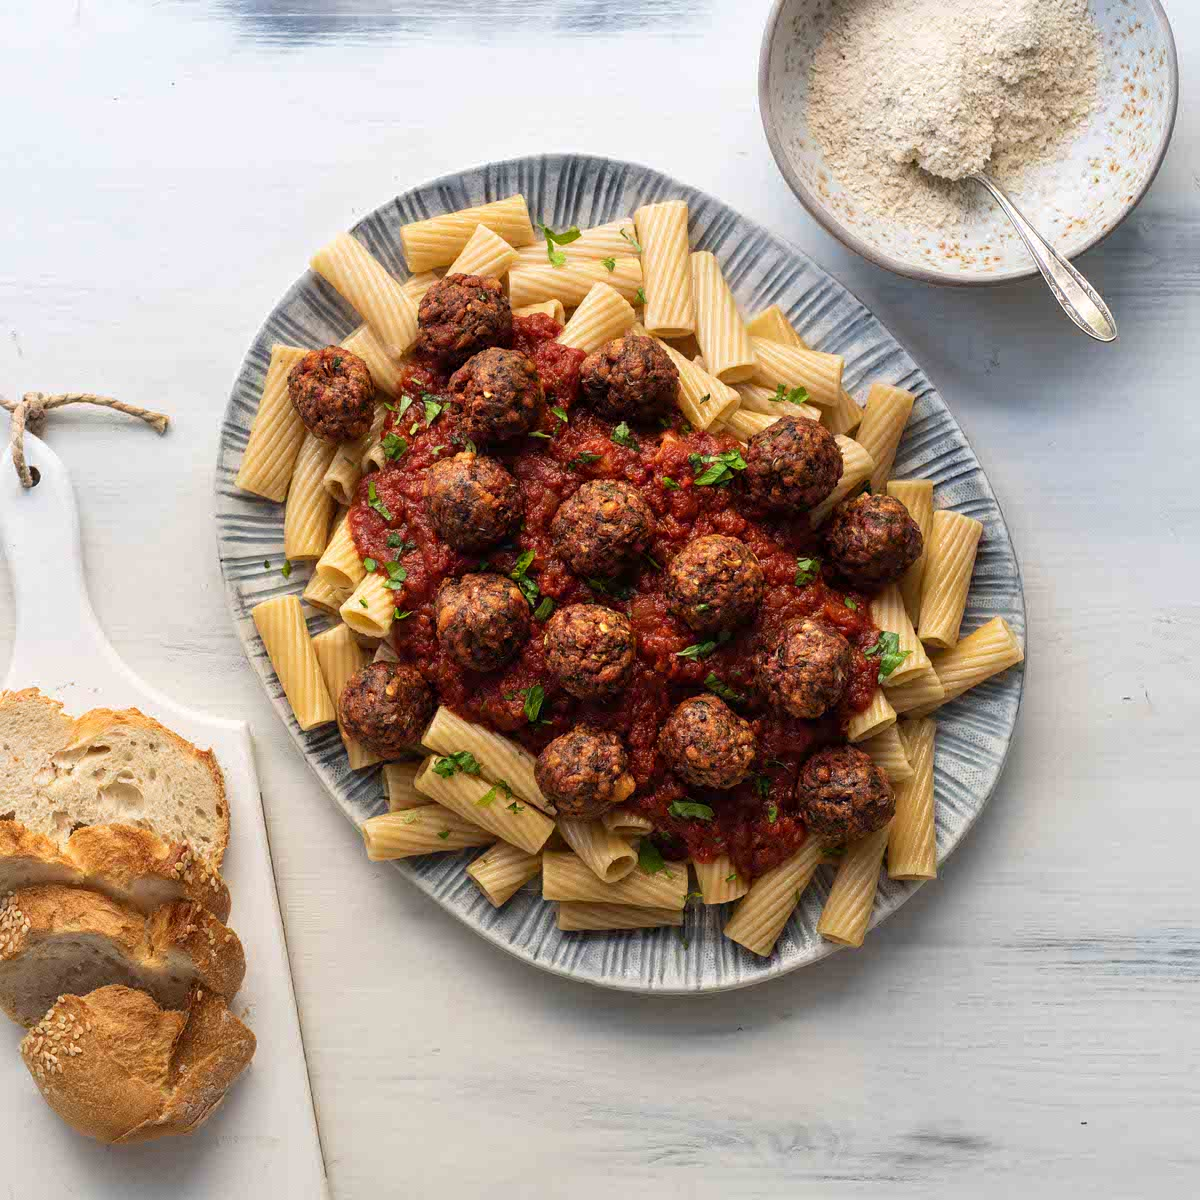 Genius Κεφτεδάκια με Σάλτσα Ντομάτας και Ζυμαρικά